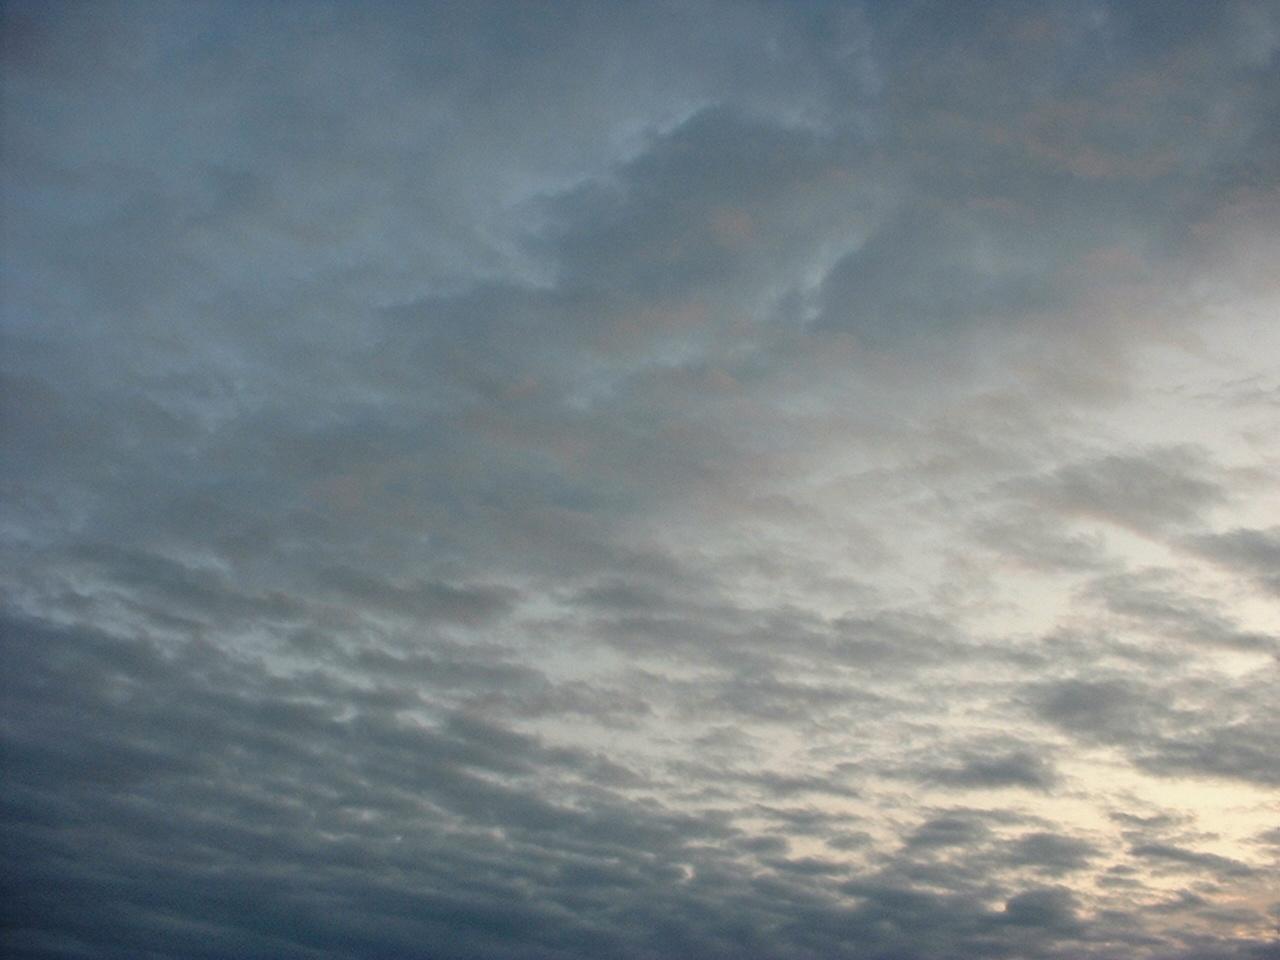 DSCF0093朝の雲空き地から北UP